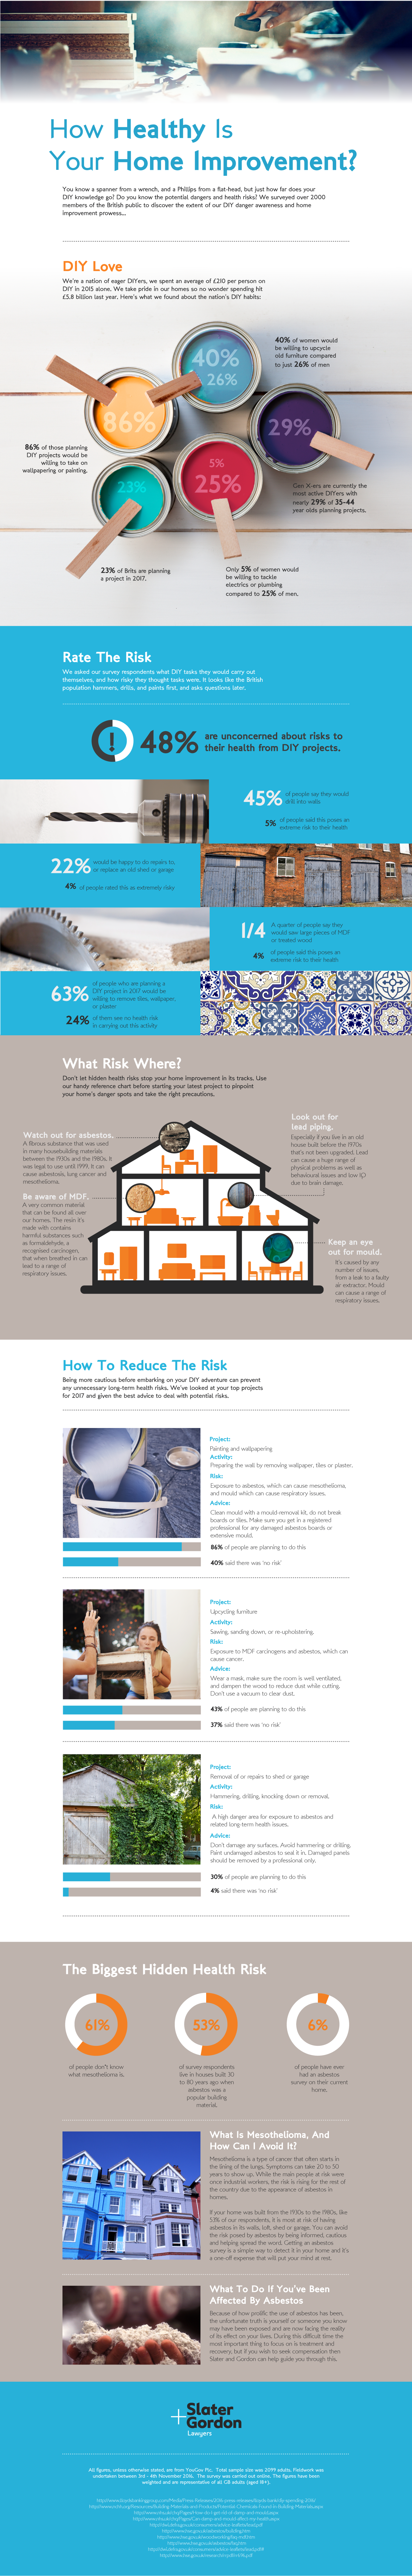 FINALSlaterGordon DIY Infographic v2 (1)